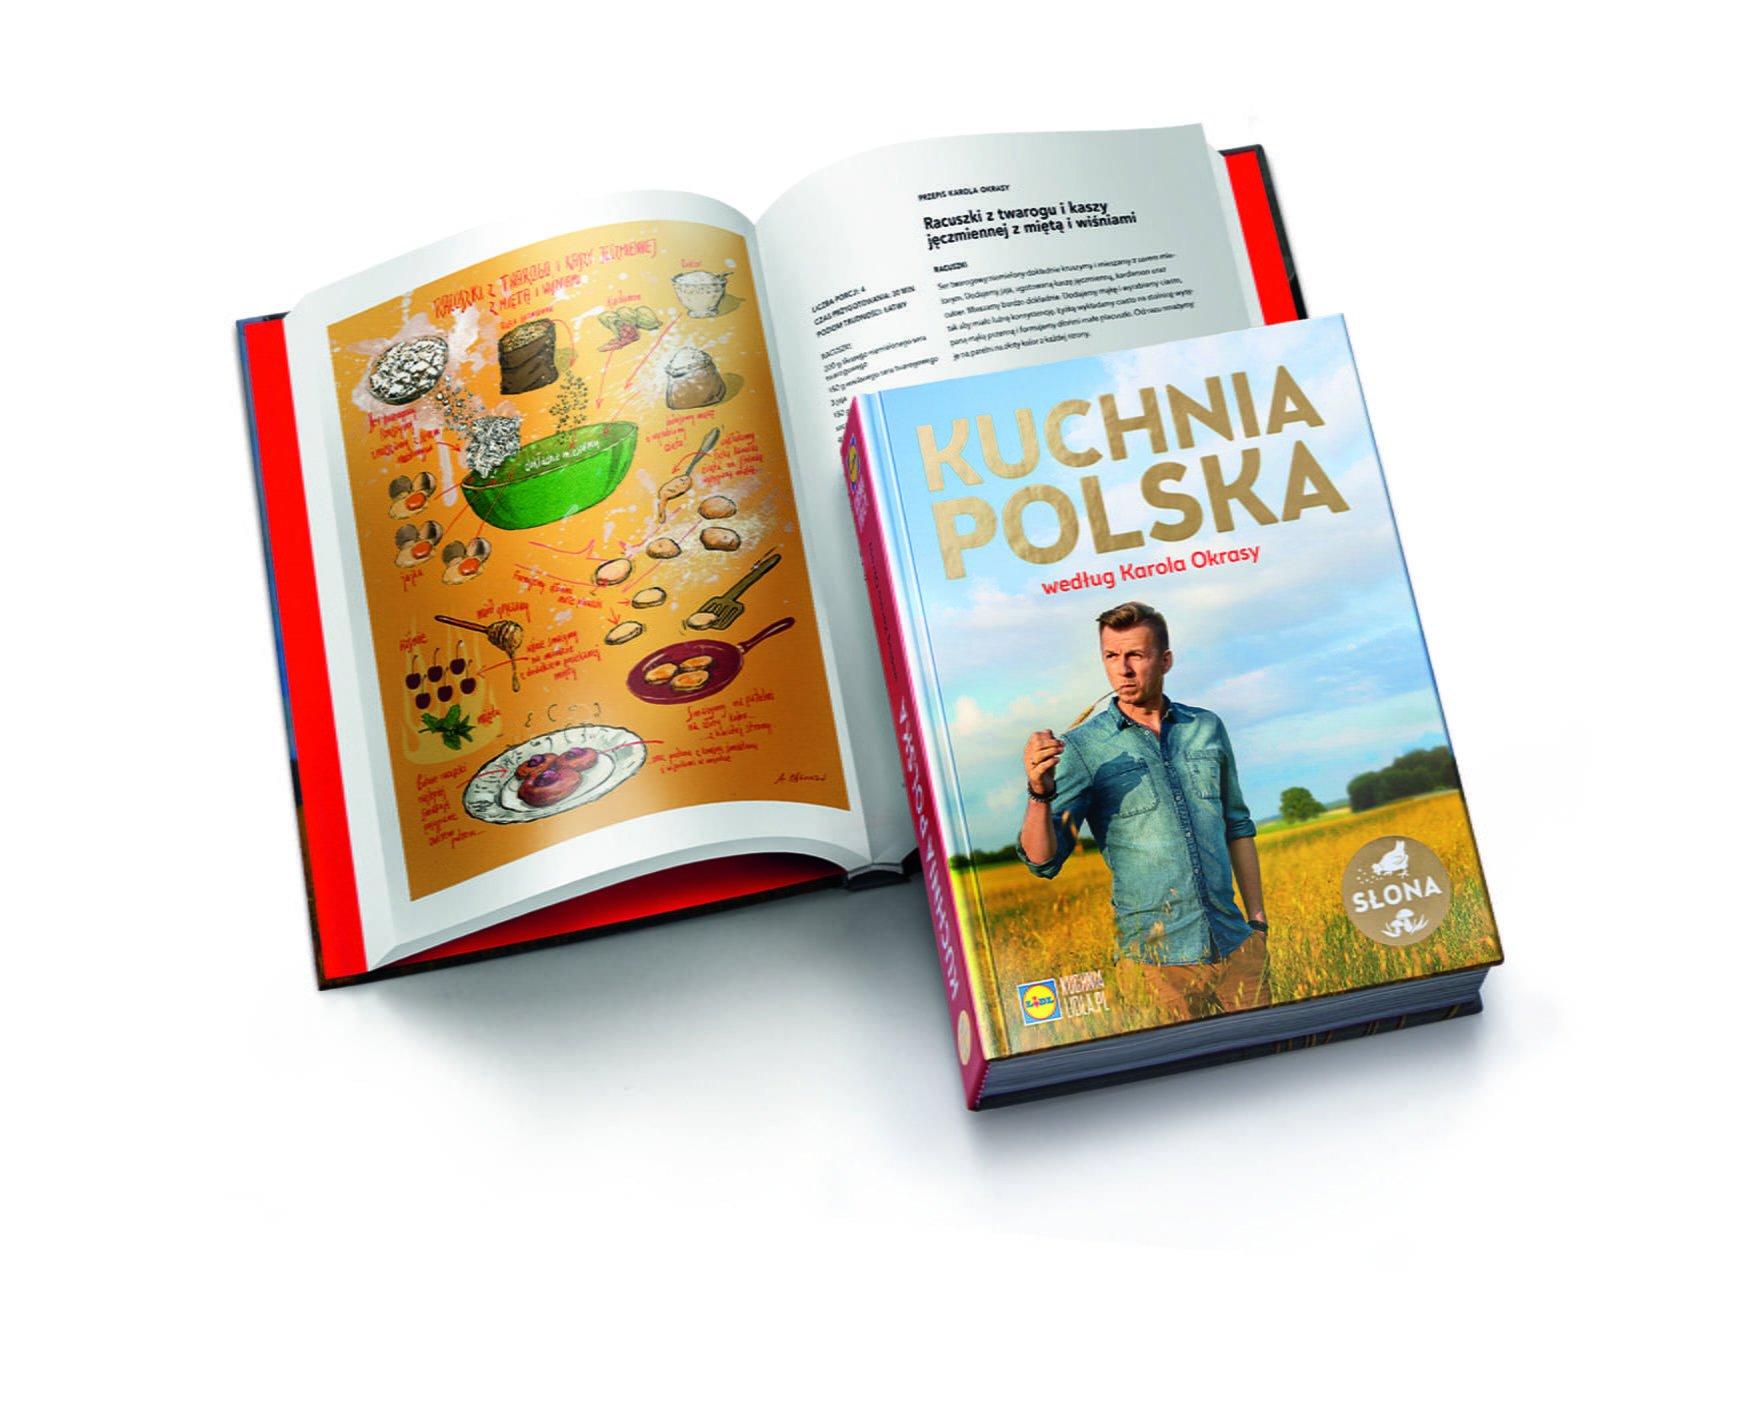 fot-lidl_kuchnia-polska_-wedeug-karola-okrasy-9